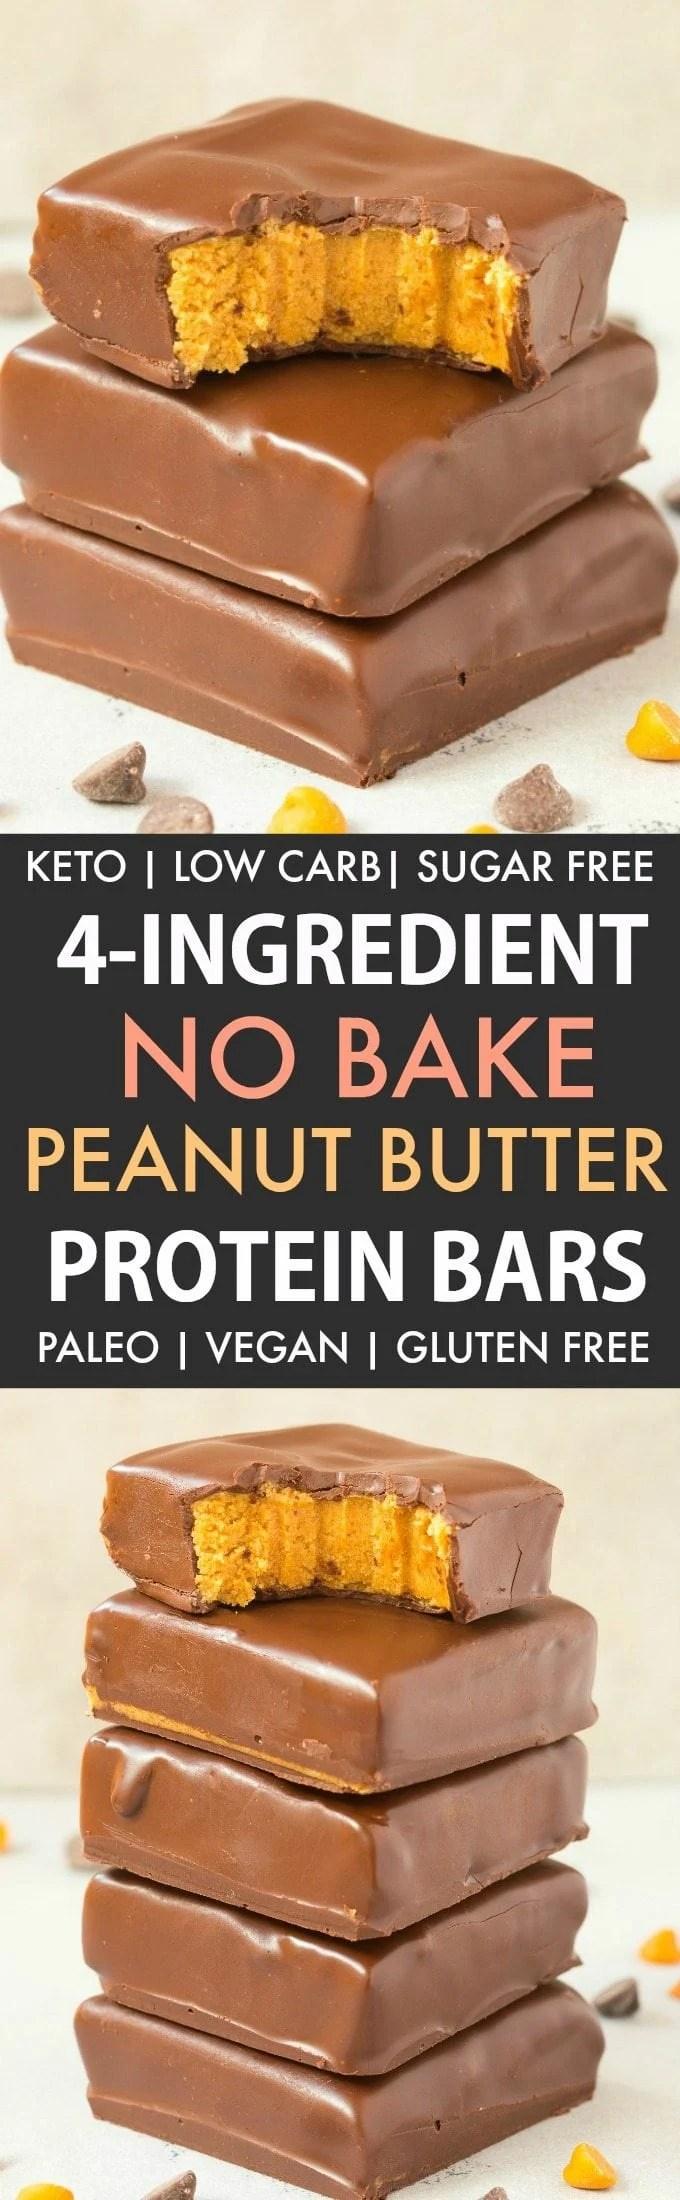 No sugar added protein bars